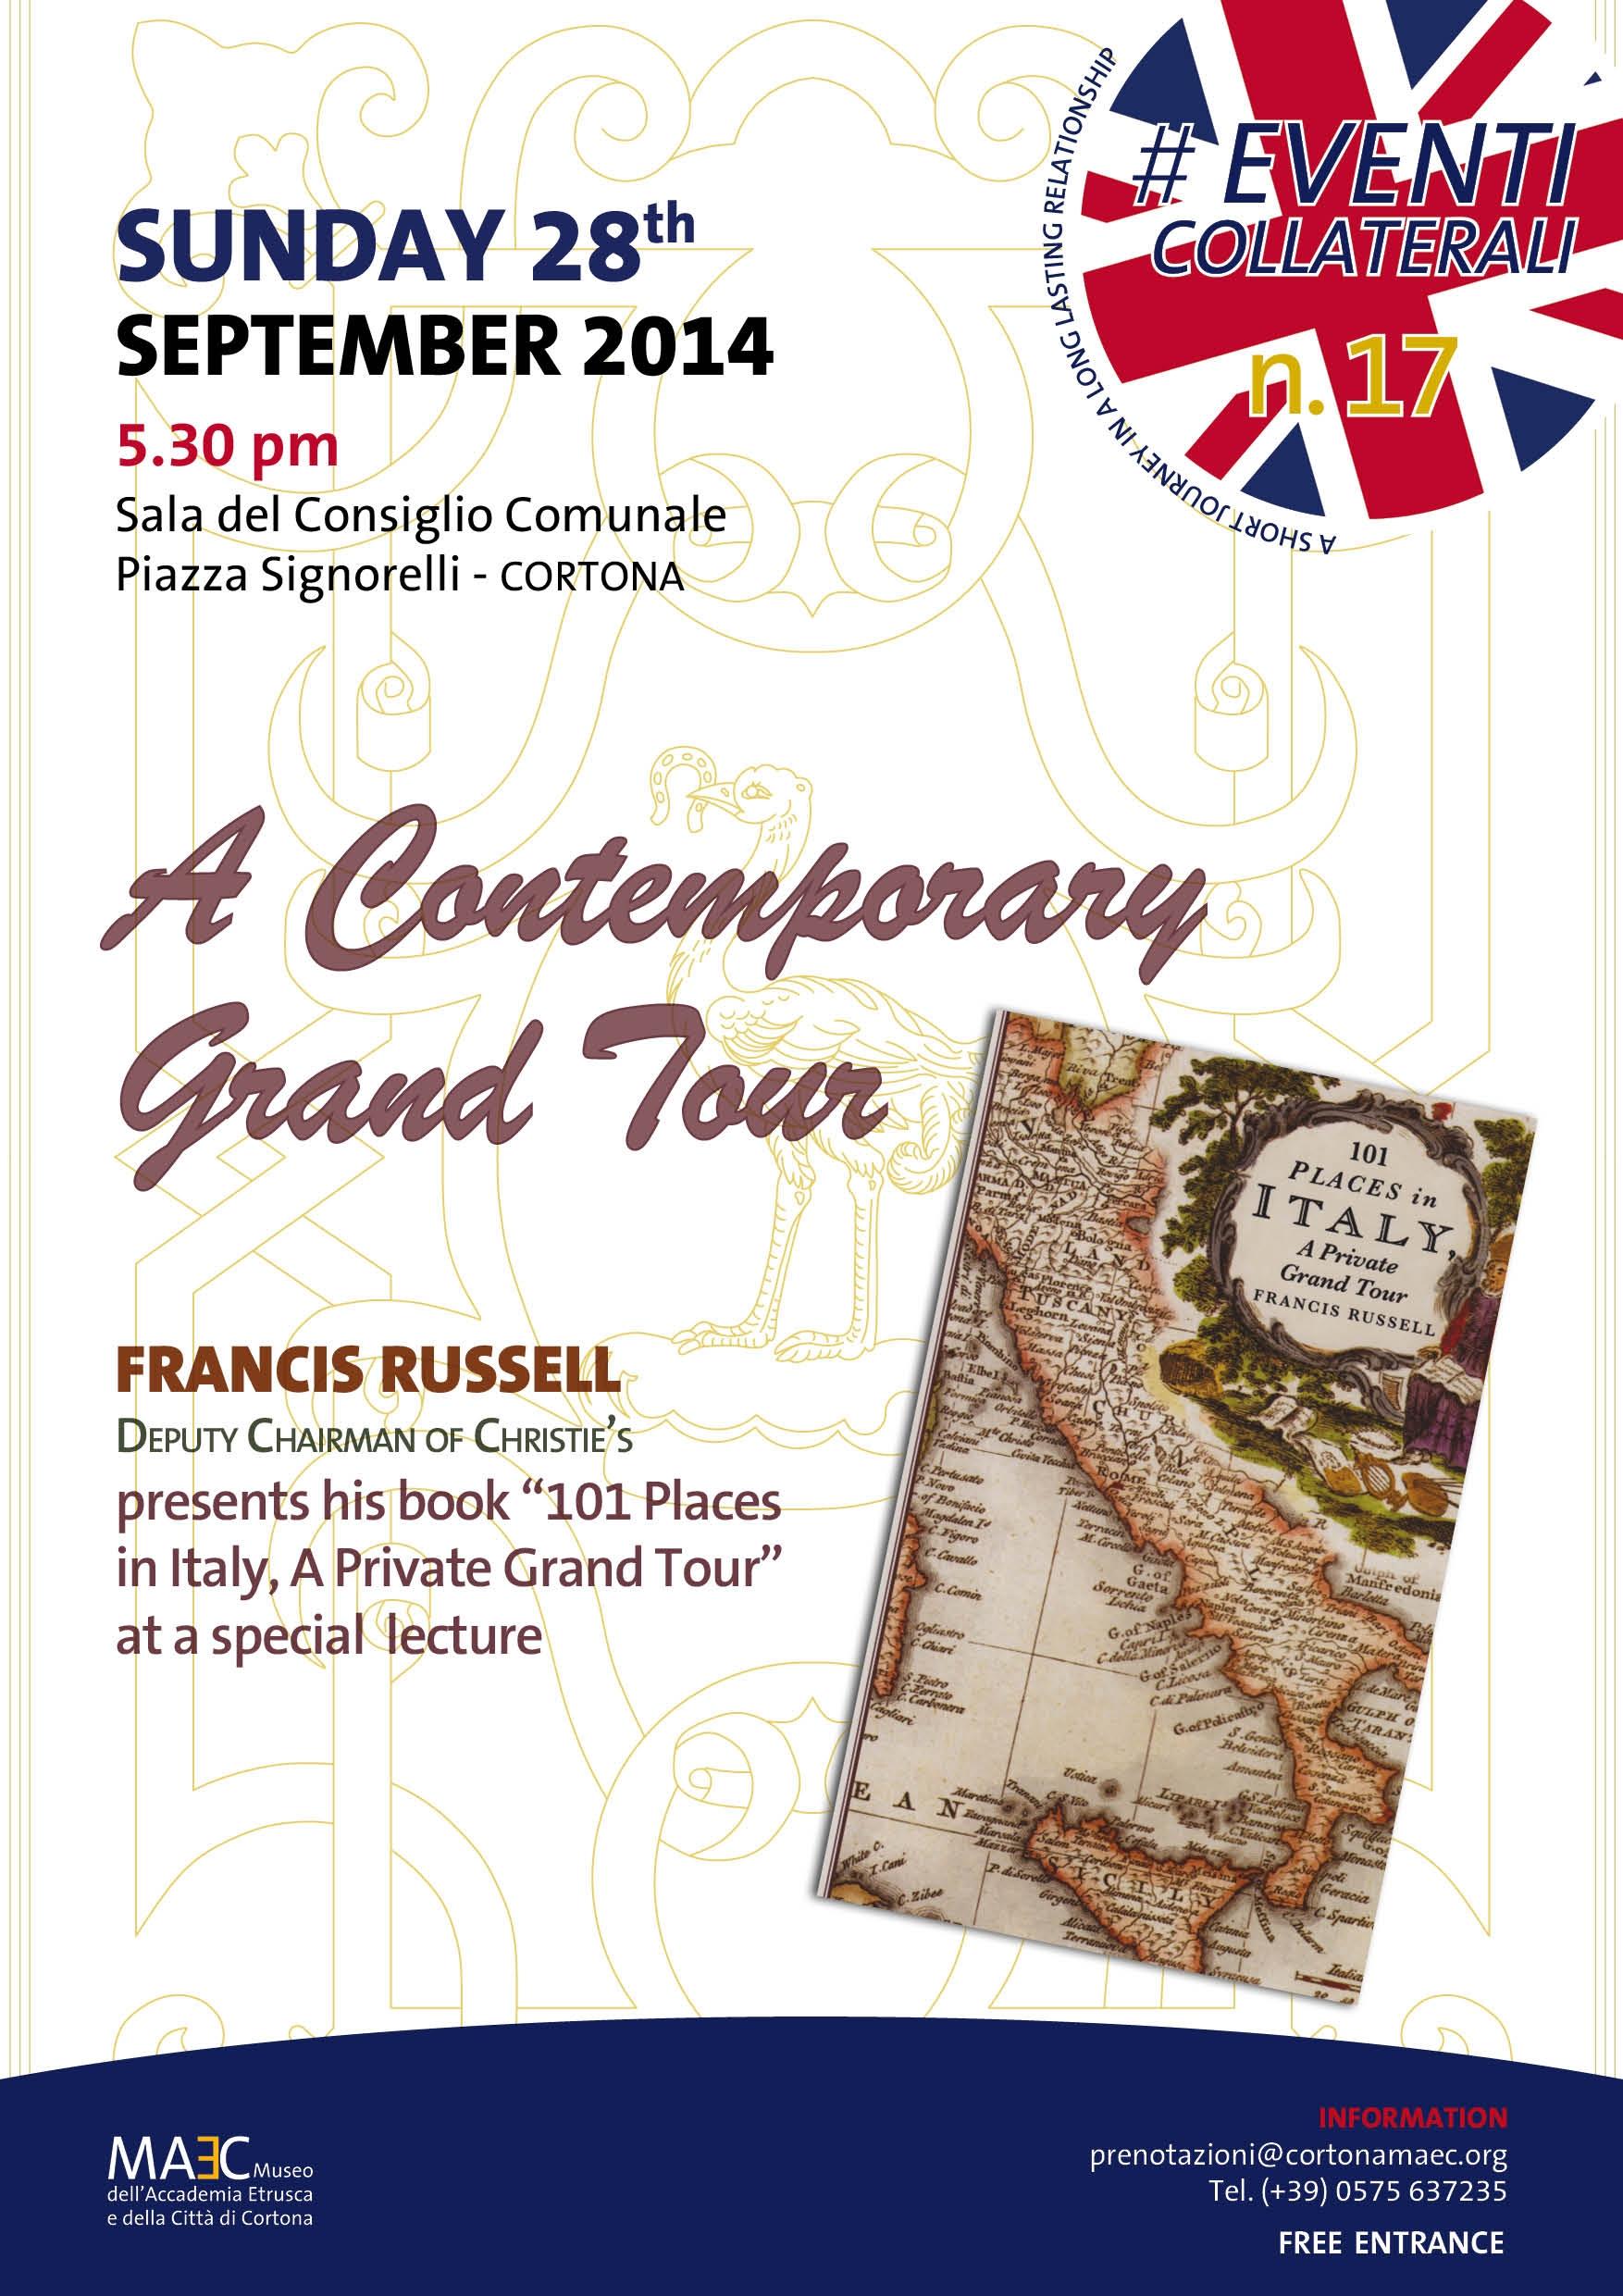 Appuntamento con Francis Russell a Cortona